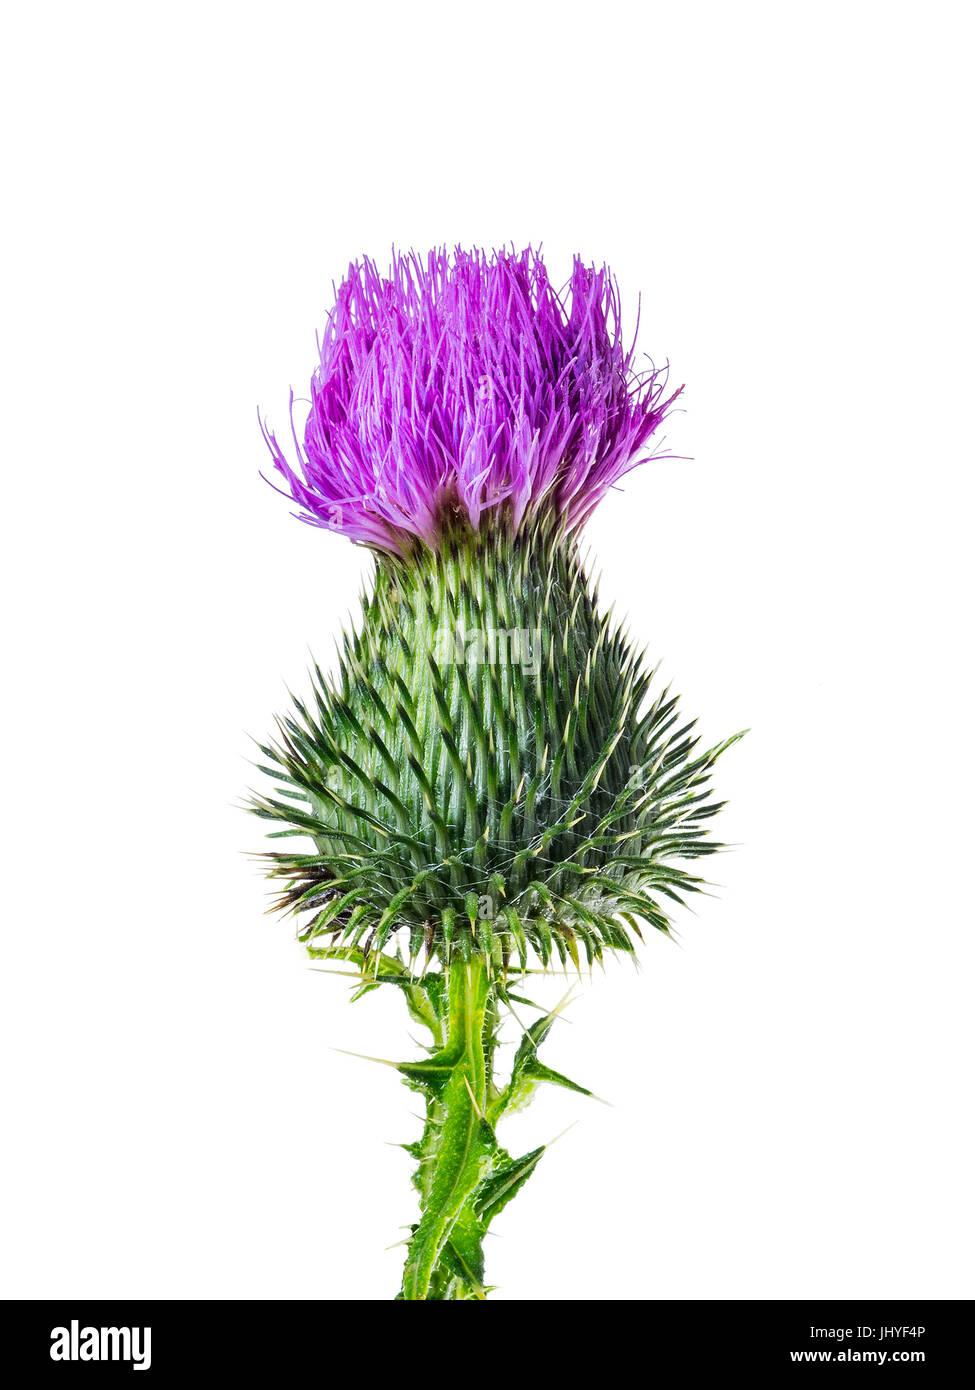 Milk Thistle Flower Medicine Herb Isolated on White - Stock Image